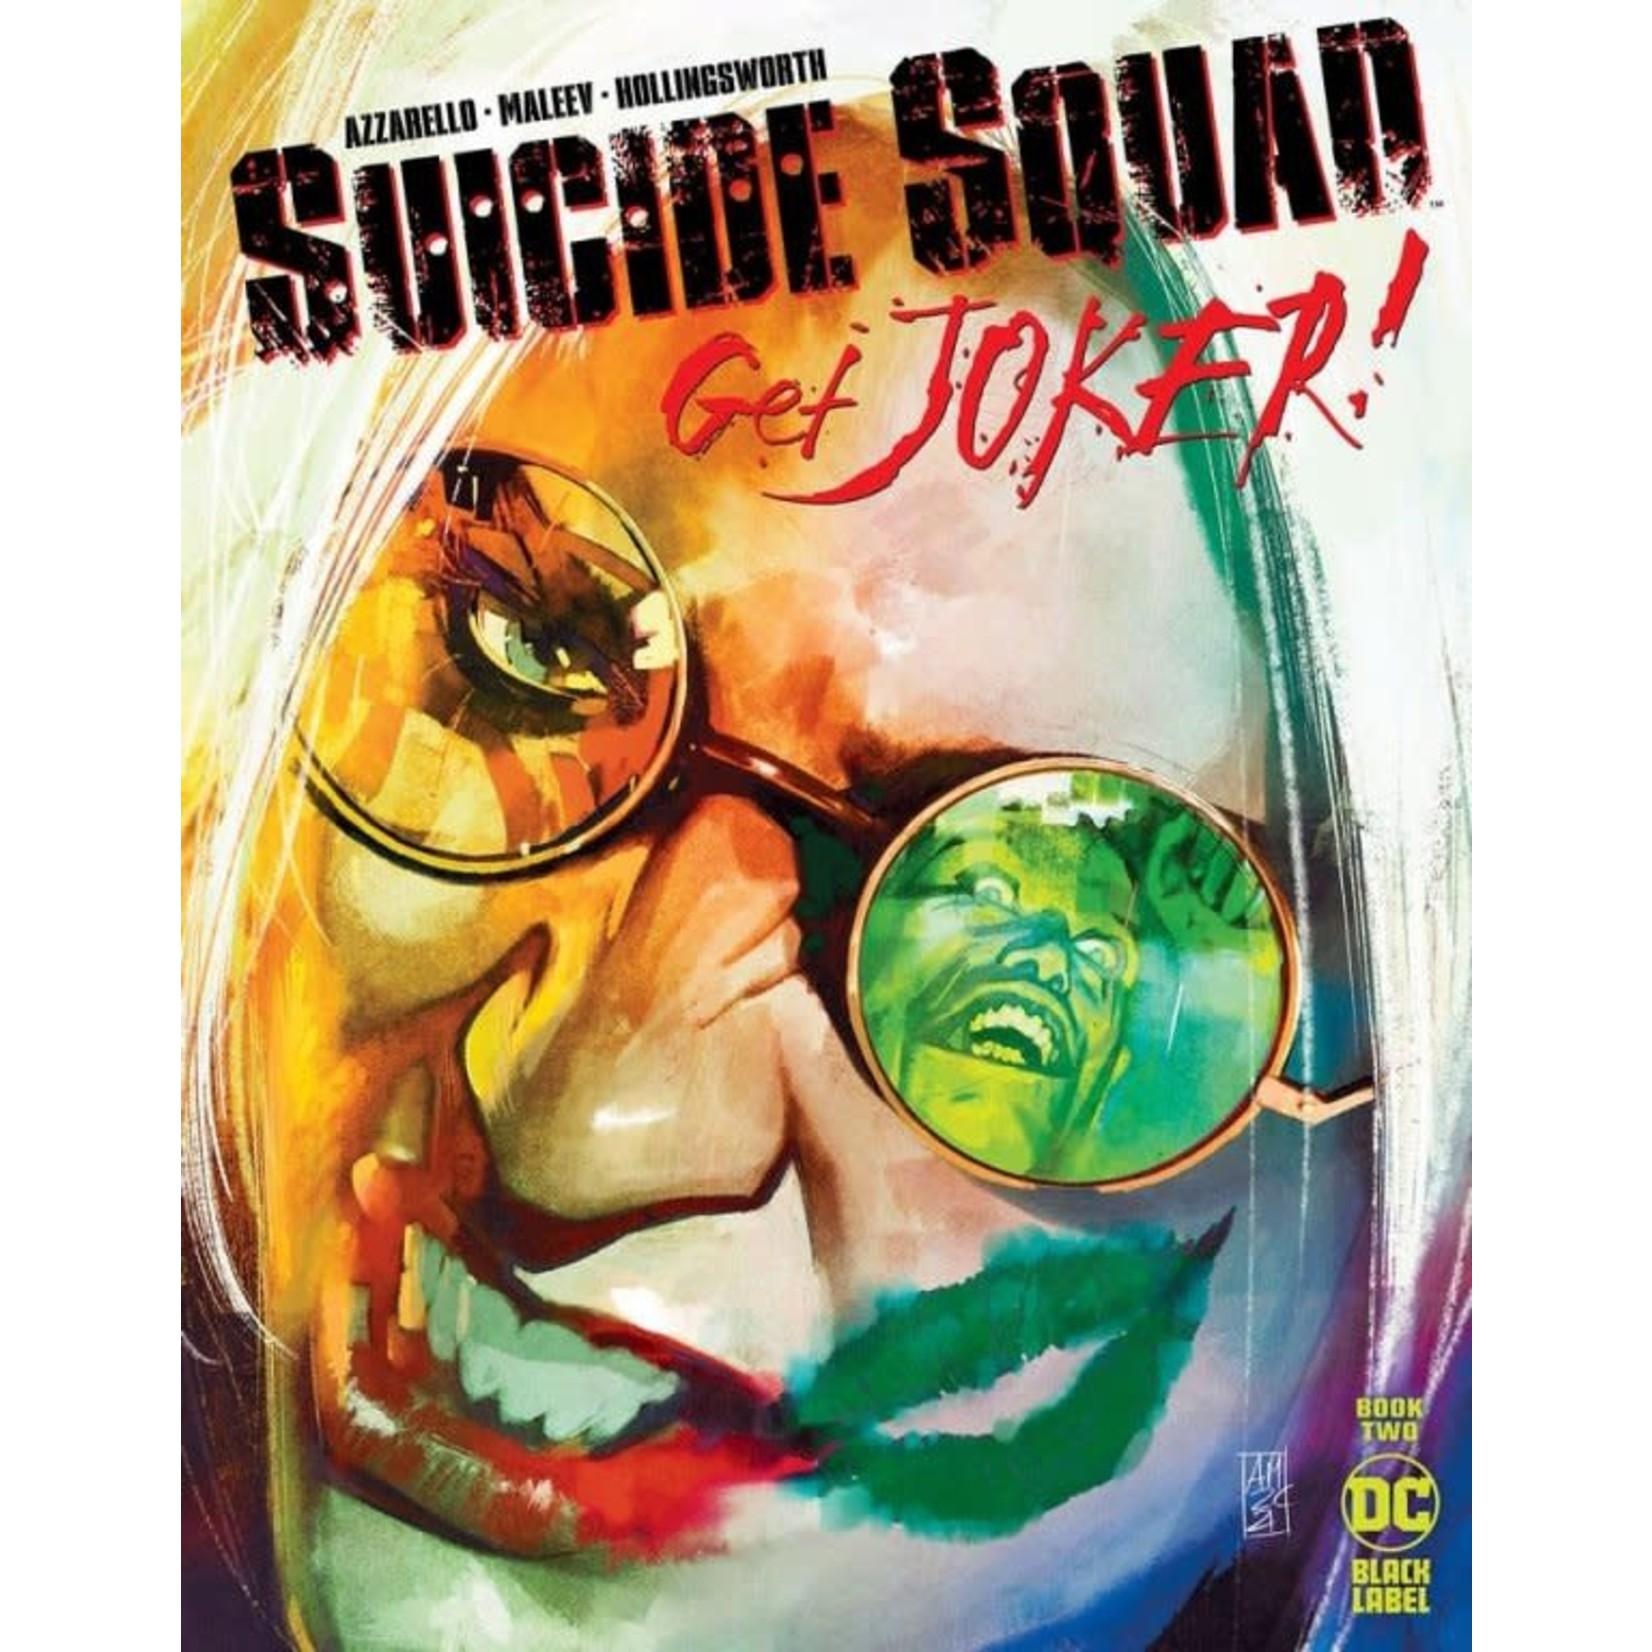 DC Comics Suicide Squad: Get Joker! #2